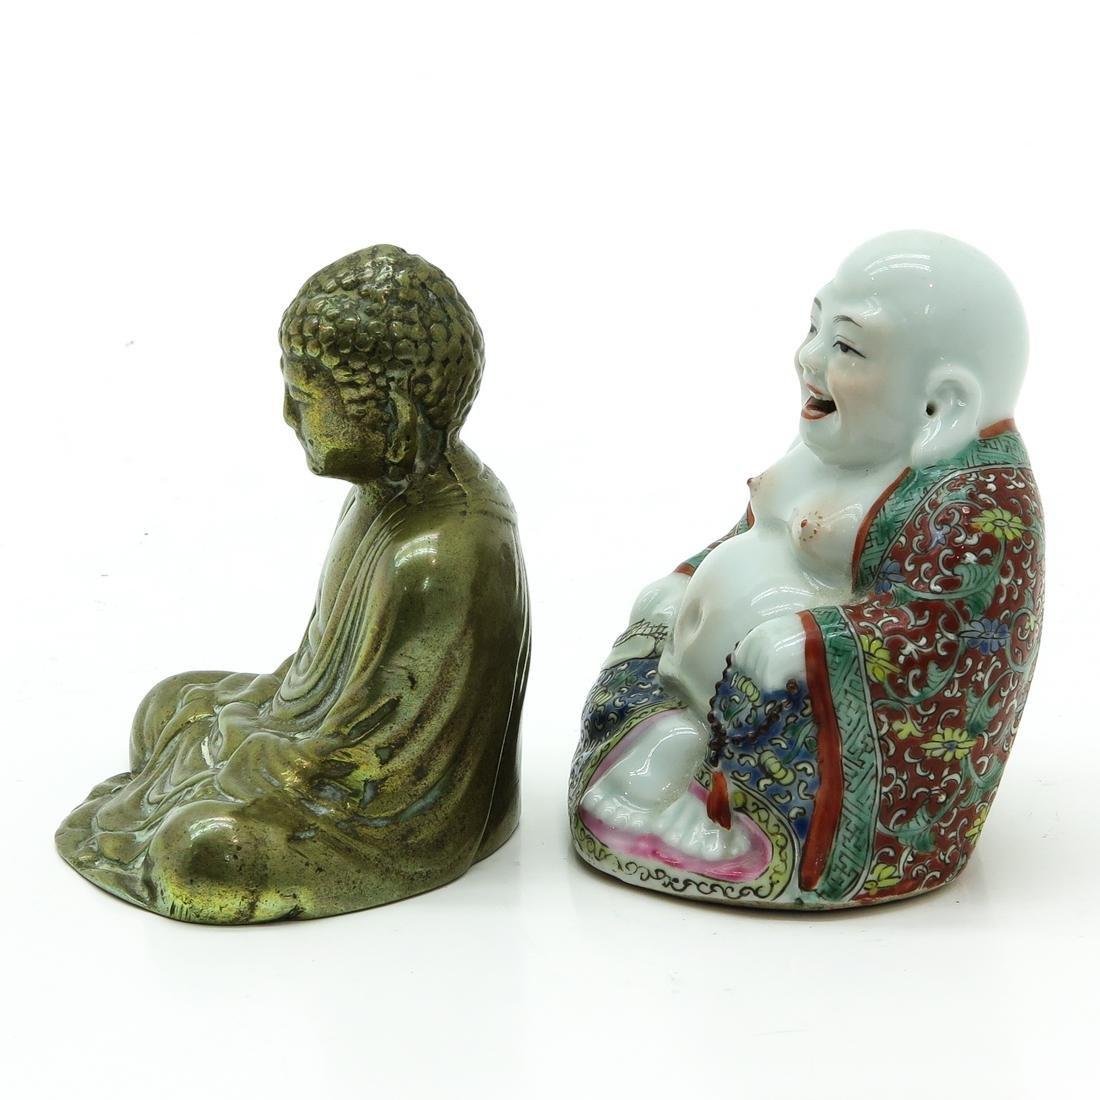 Lot of 2 Buddha Sculptures - 2